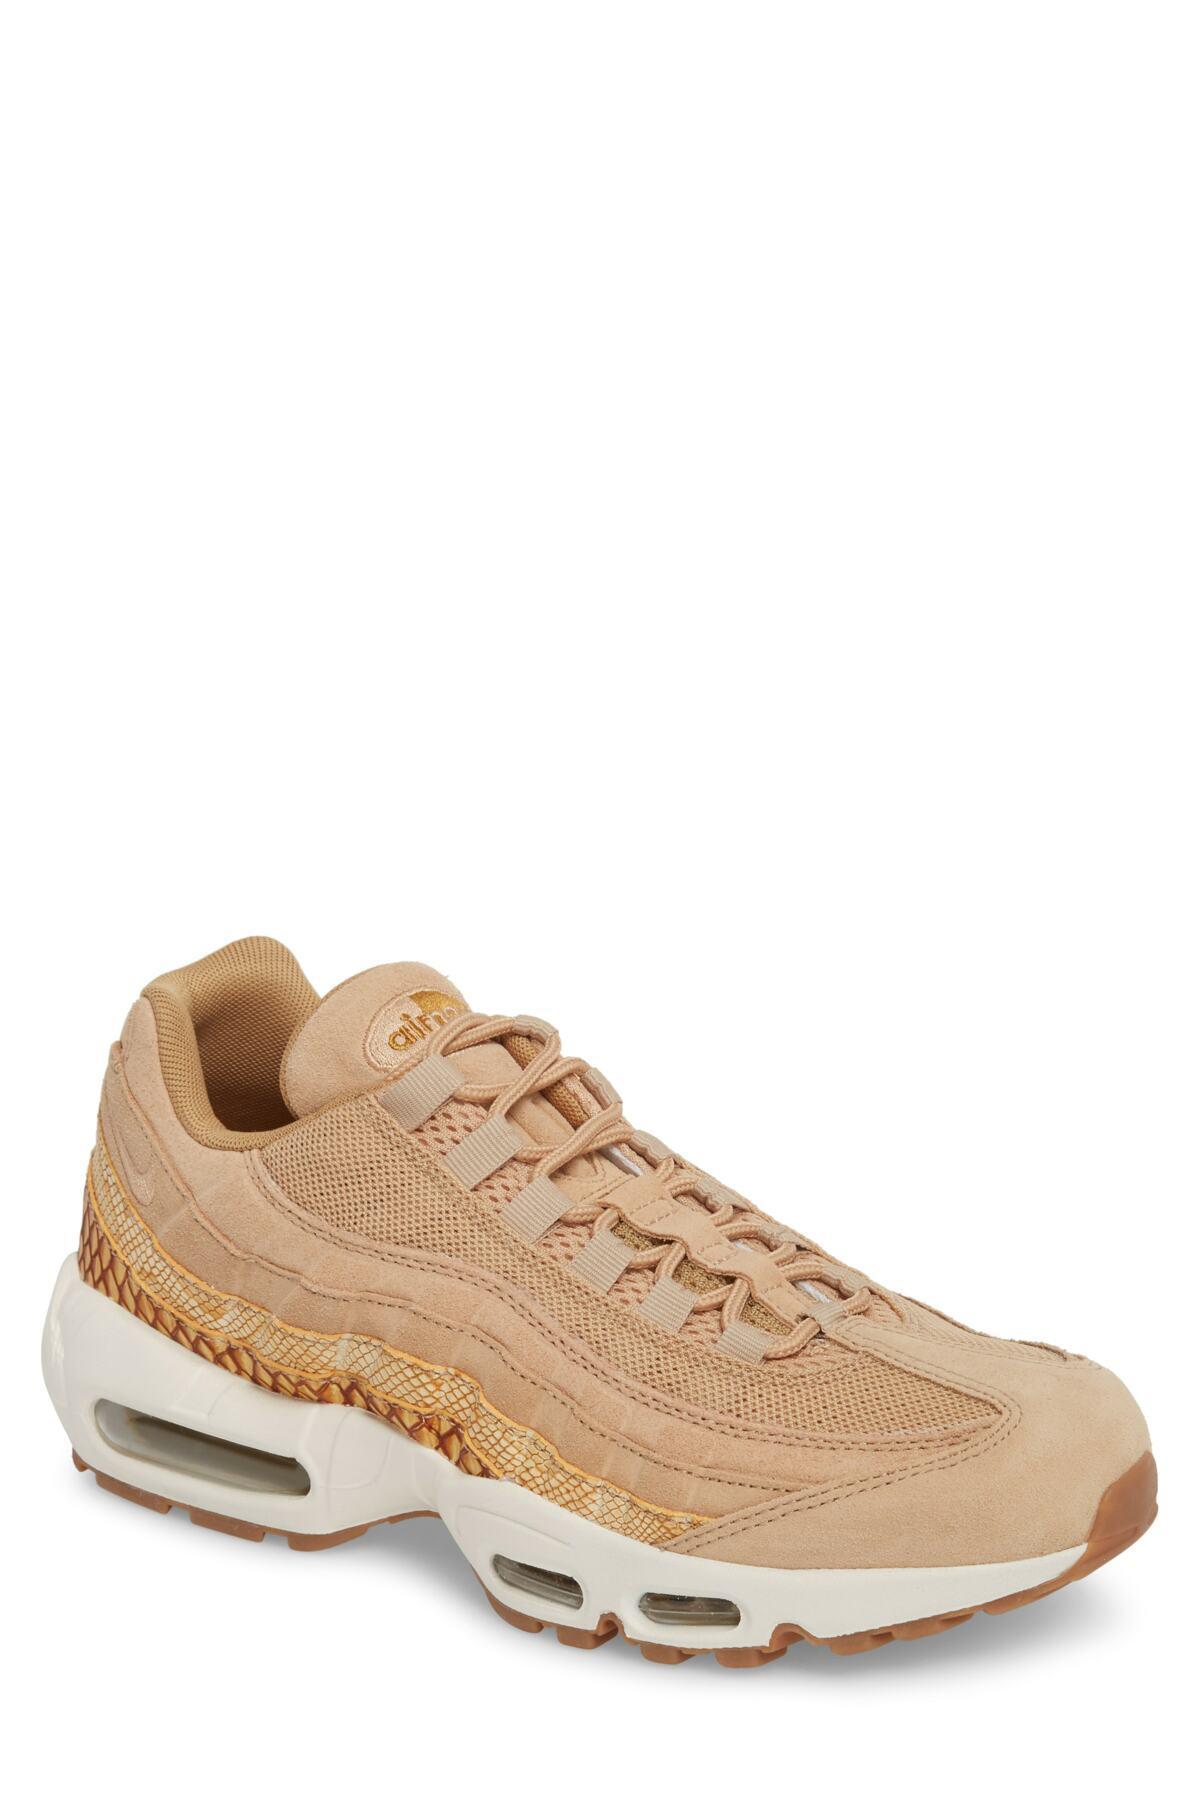 finest selection cee2f 5eb13 Nike. Brown Air Max 95 Premium Se Sneaker (men)